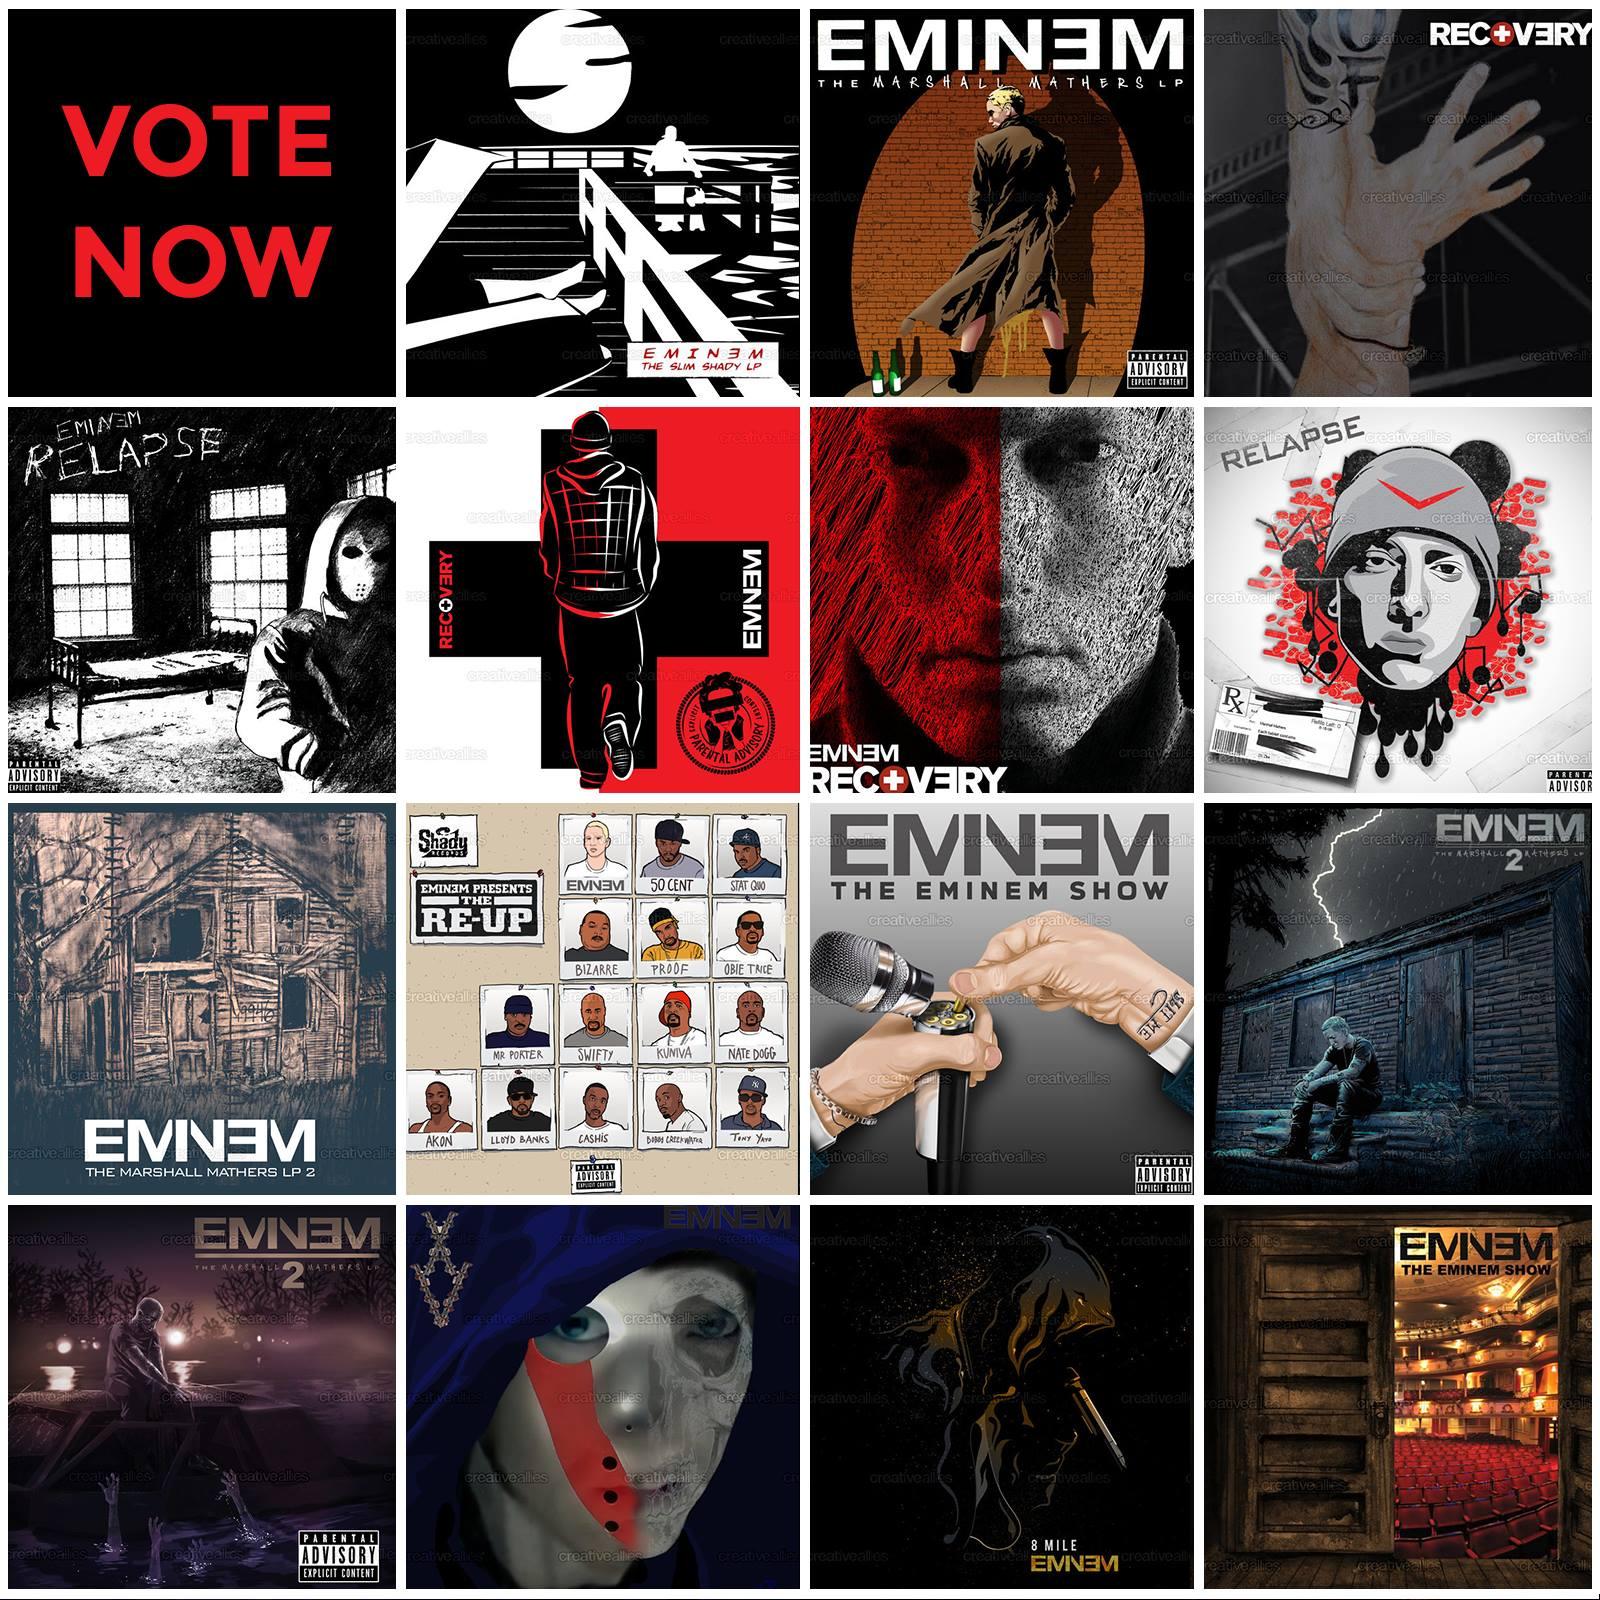 2015.05.20 - Eminem CreativeAllies